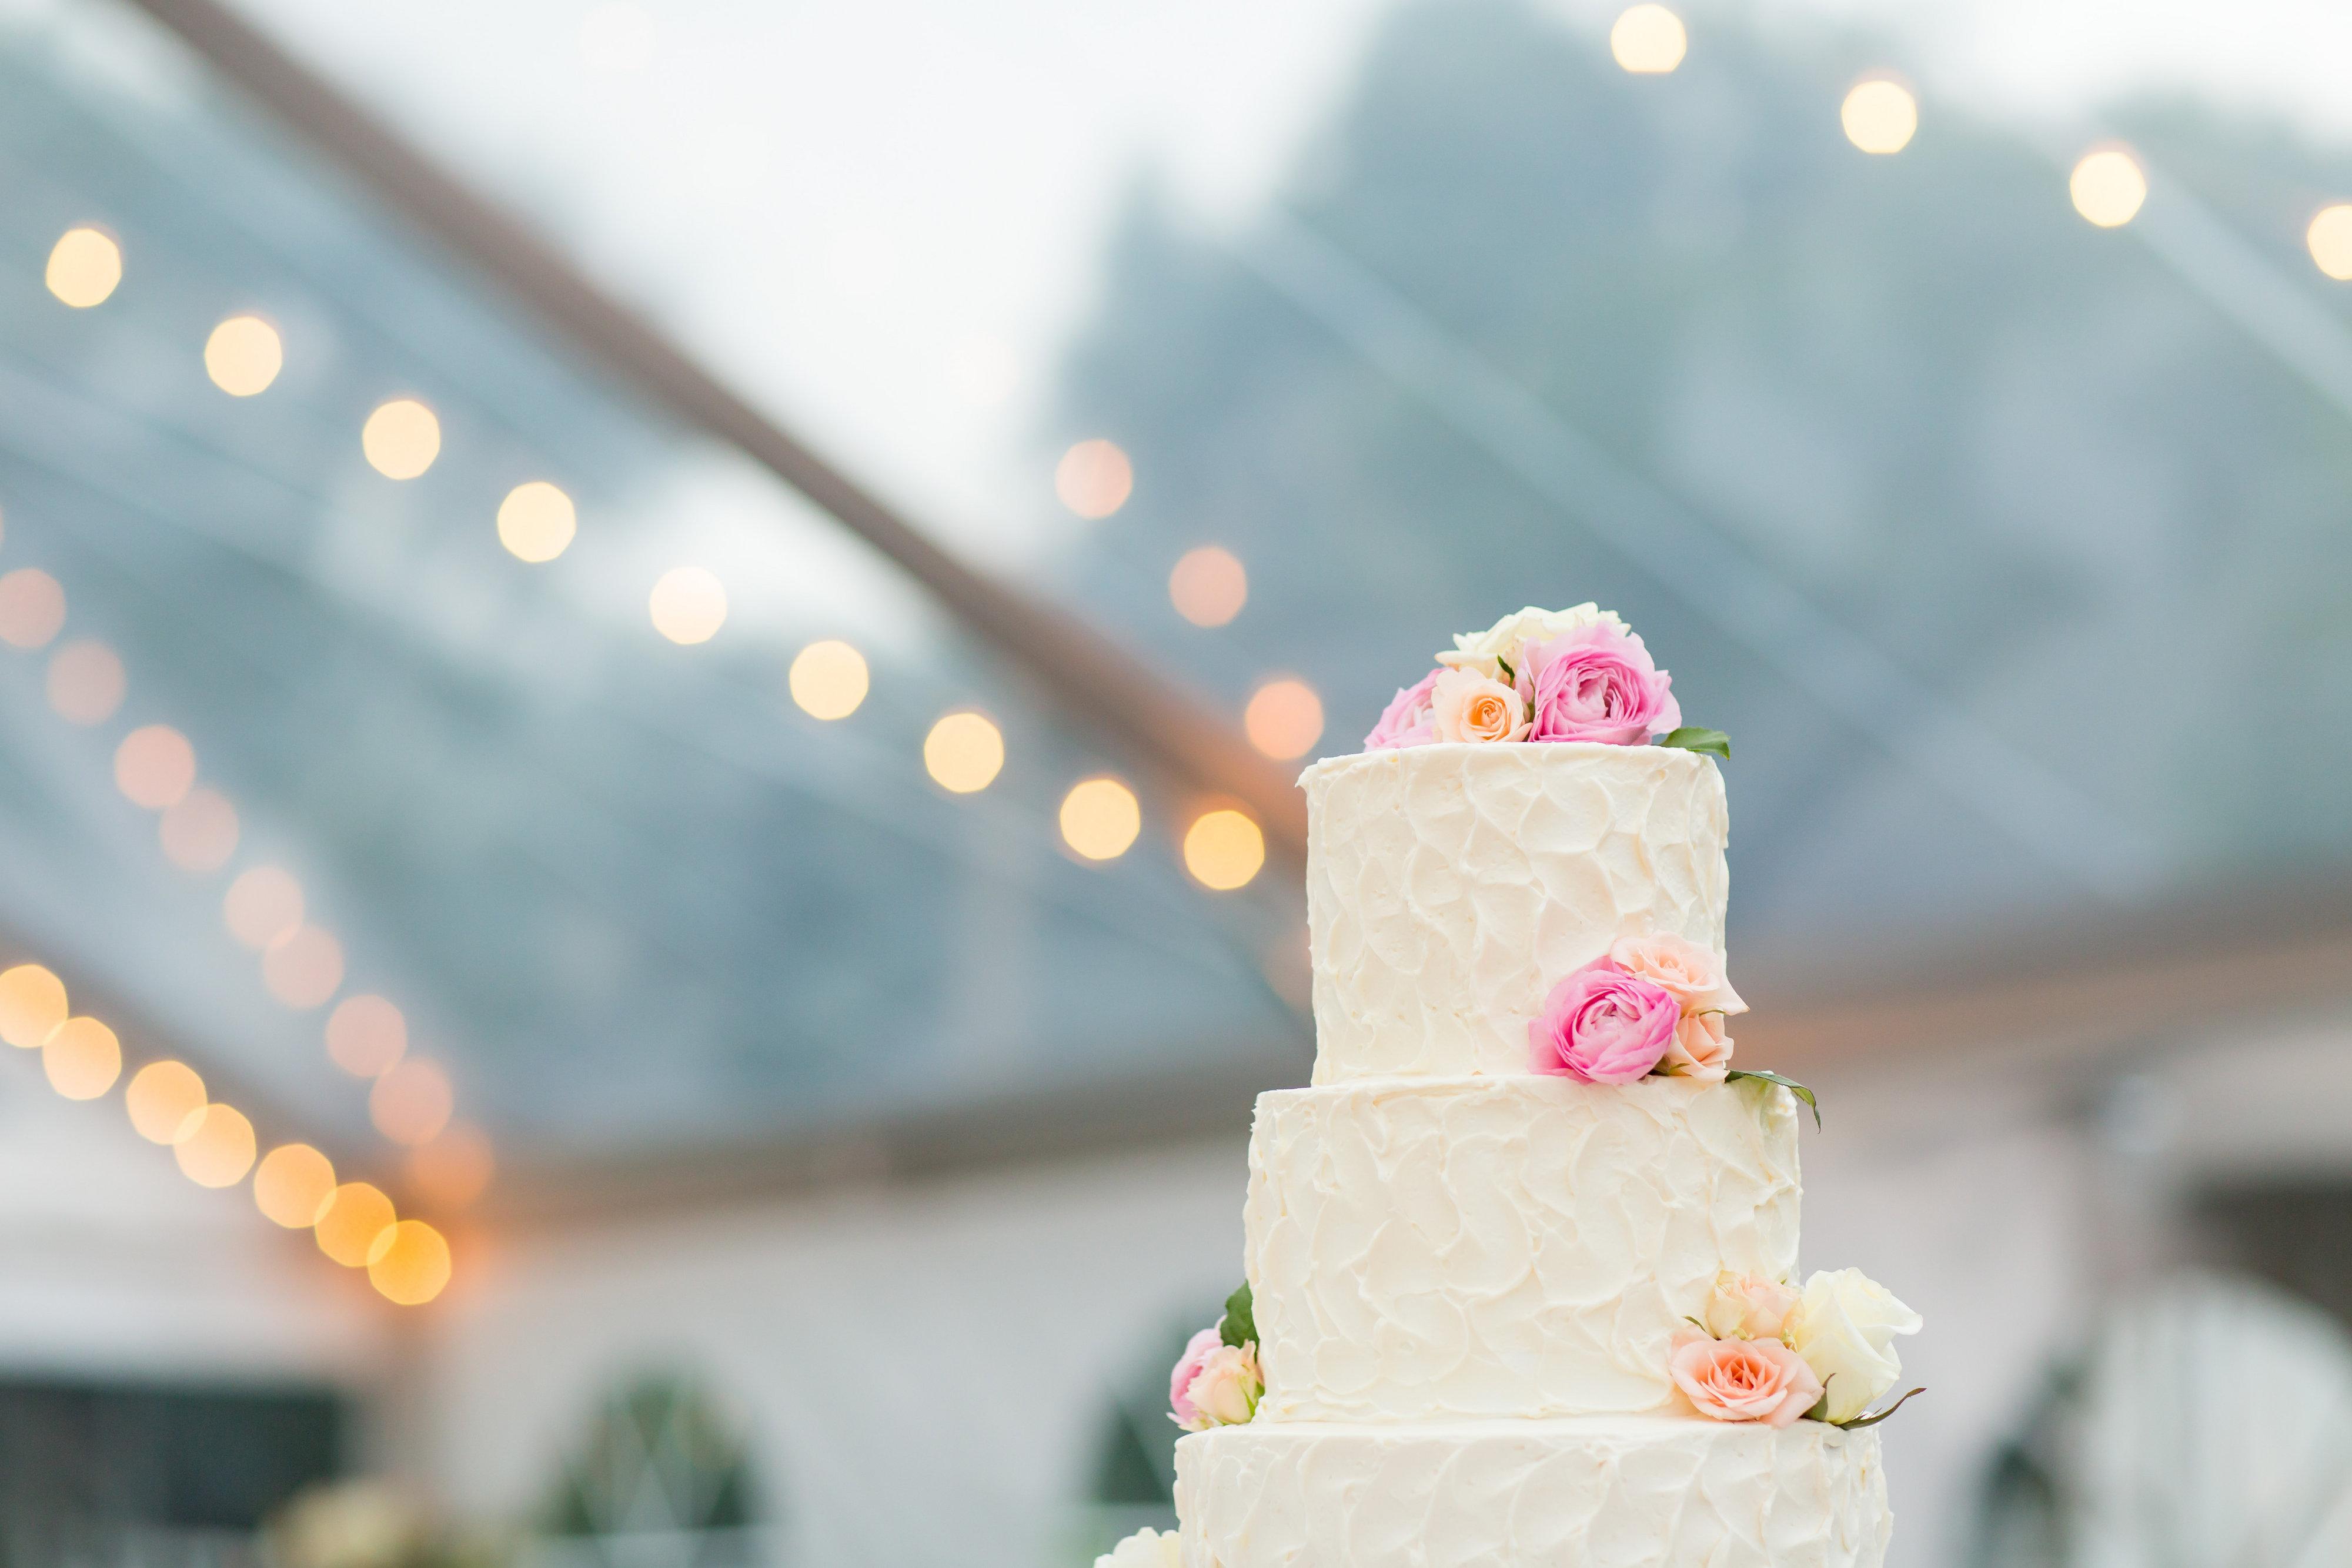 Wedding Cake Tasting.Preparing For Your Wedding Cake Tasting